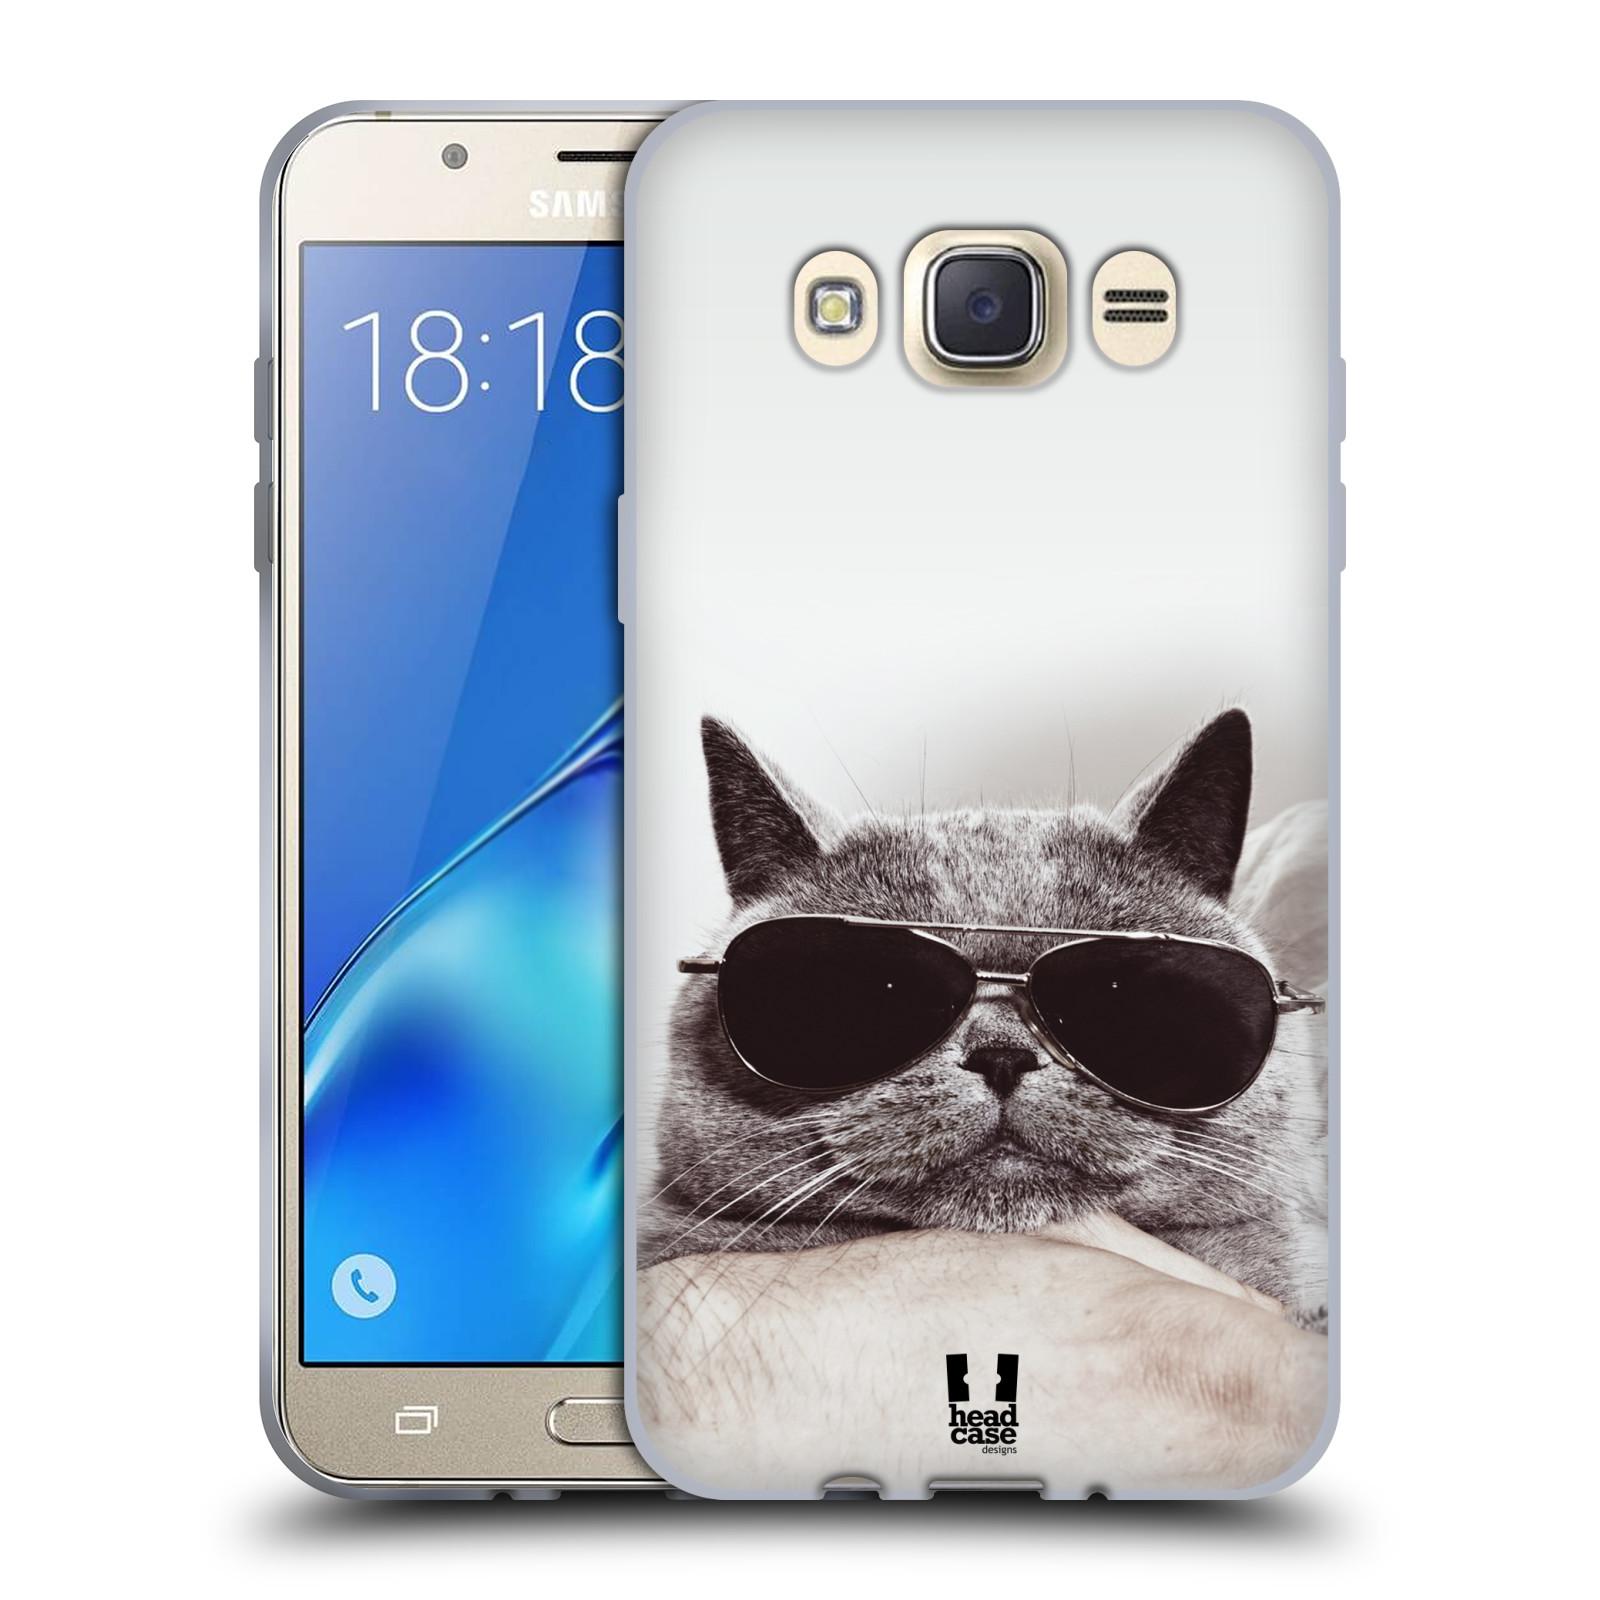 Silikonové pouzdro na mobil Samsung Galaxy J7 (2016) HEAD CASE KOTĚ S BRÝLEMI (Silikonový kryt či obal na mobilní telefon Samsung Galaxy J7 (2016) SM-J710)